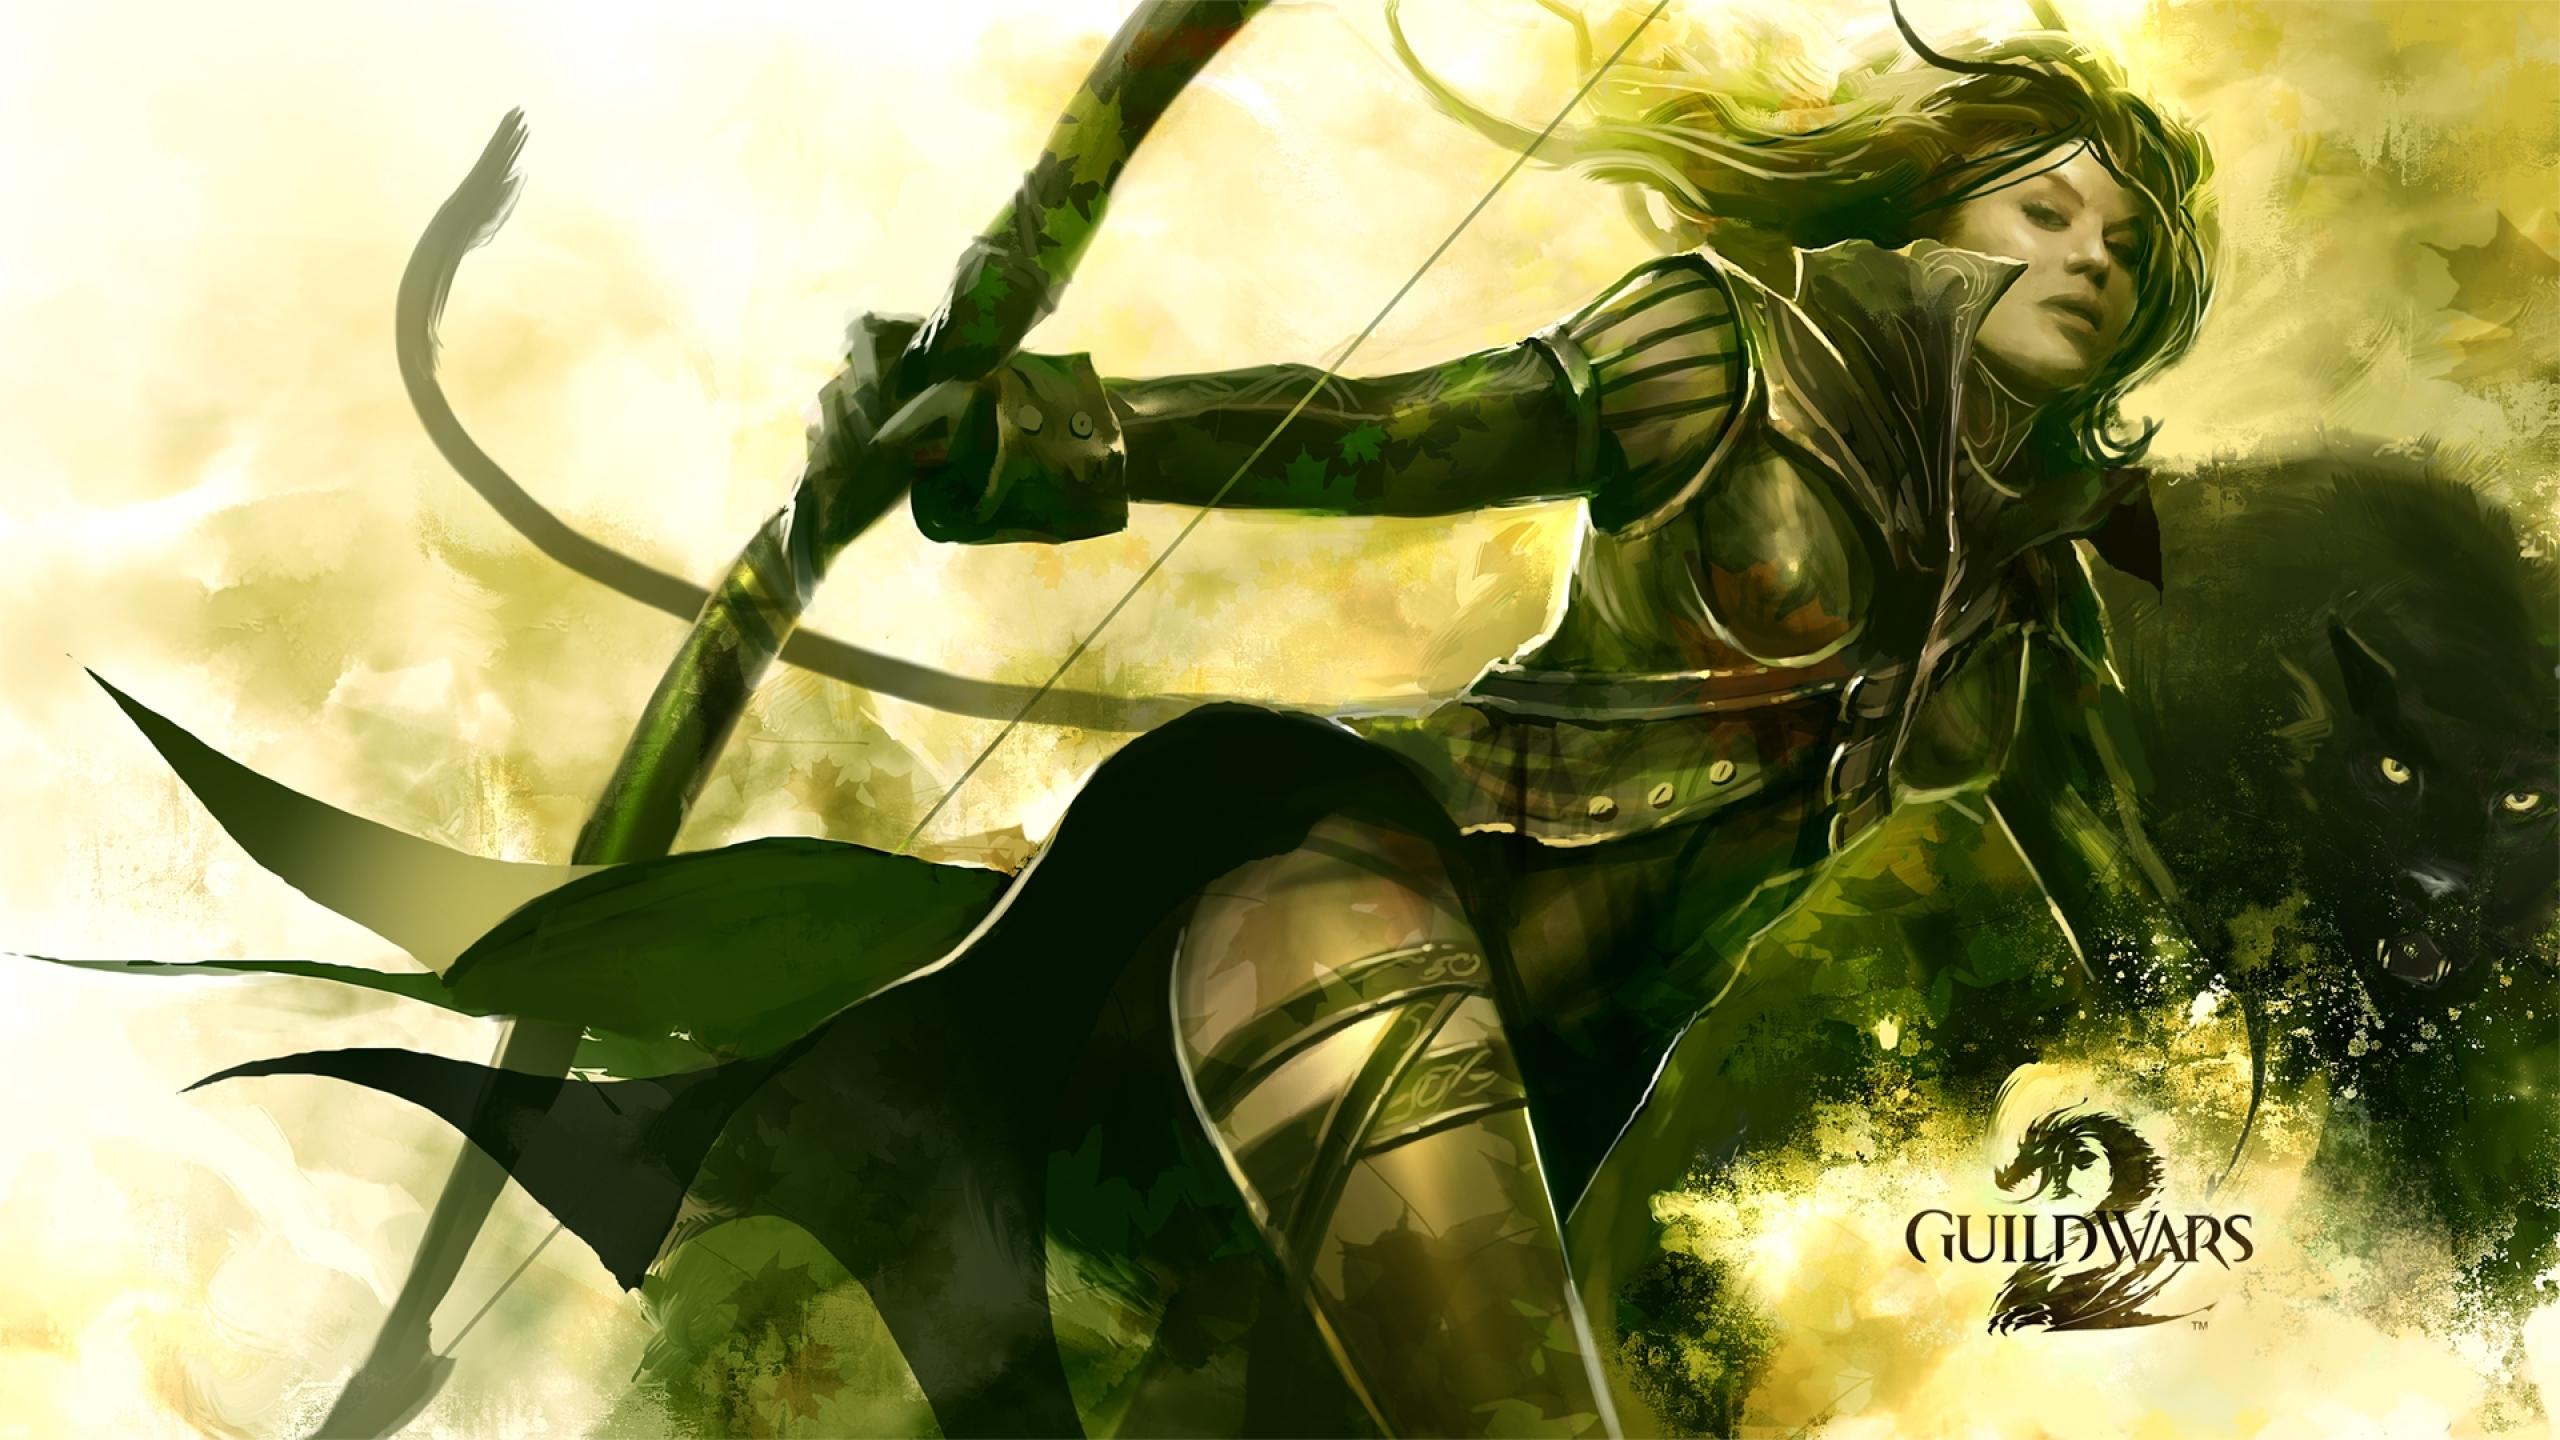 2560x1440 Guild Wars 2 Girl Bow 1440p Resolution Wallpaper Hd